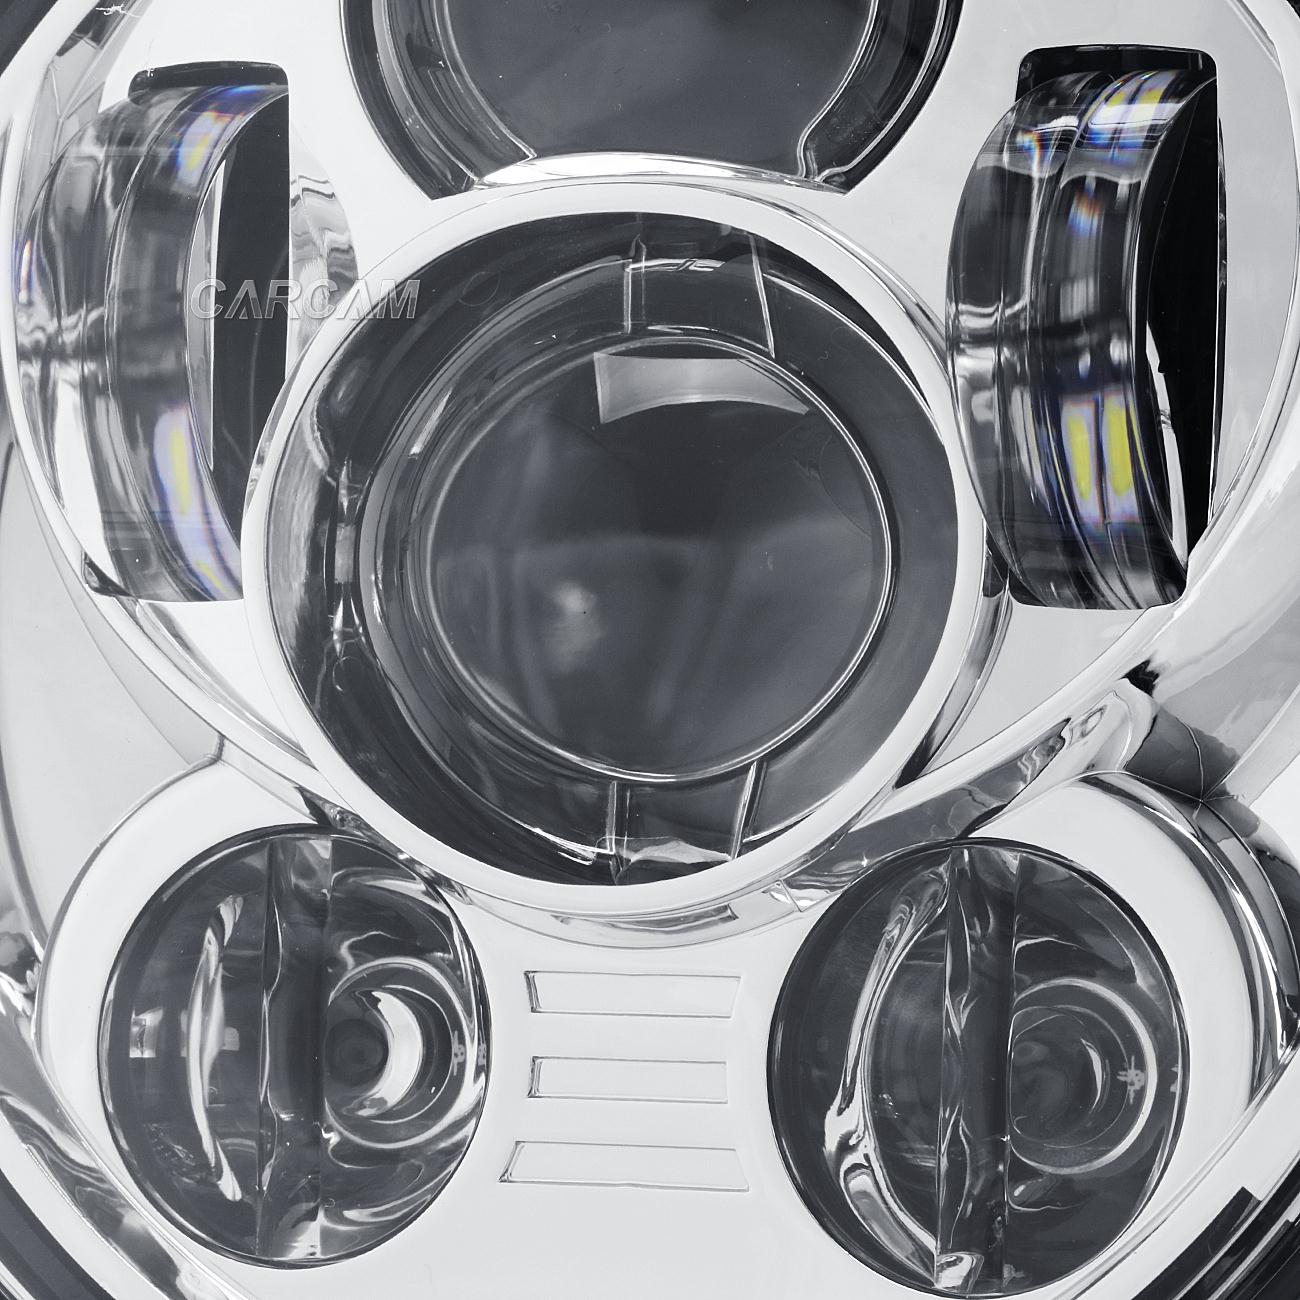 5 3 4 Quot 45w Chrome Led Daymaker Headlight Bulb For Harley